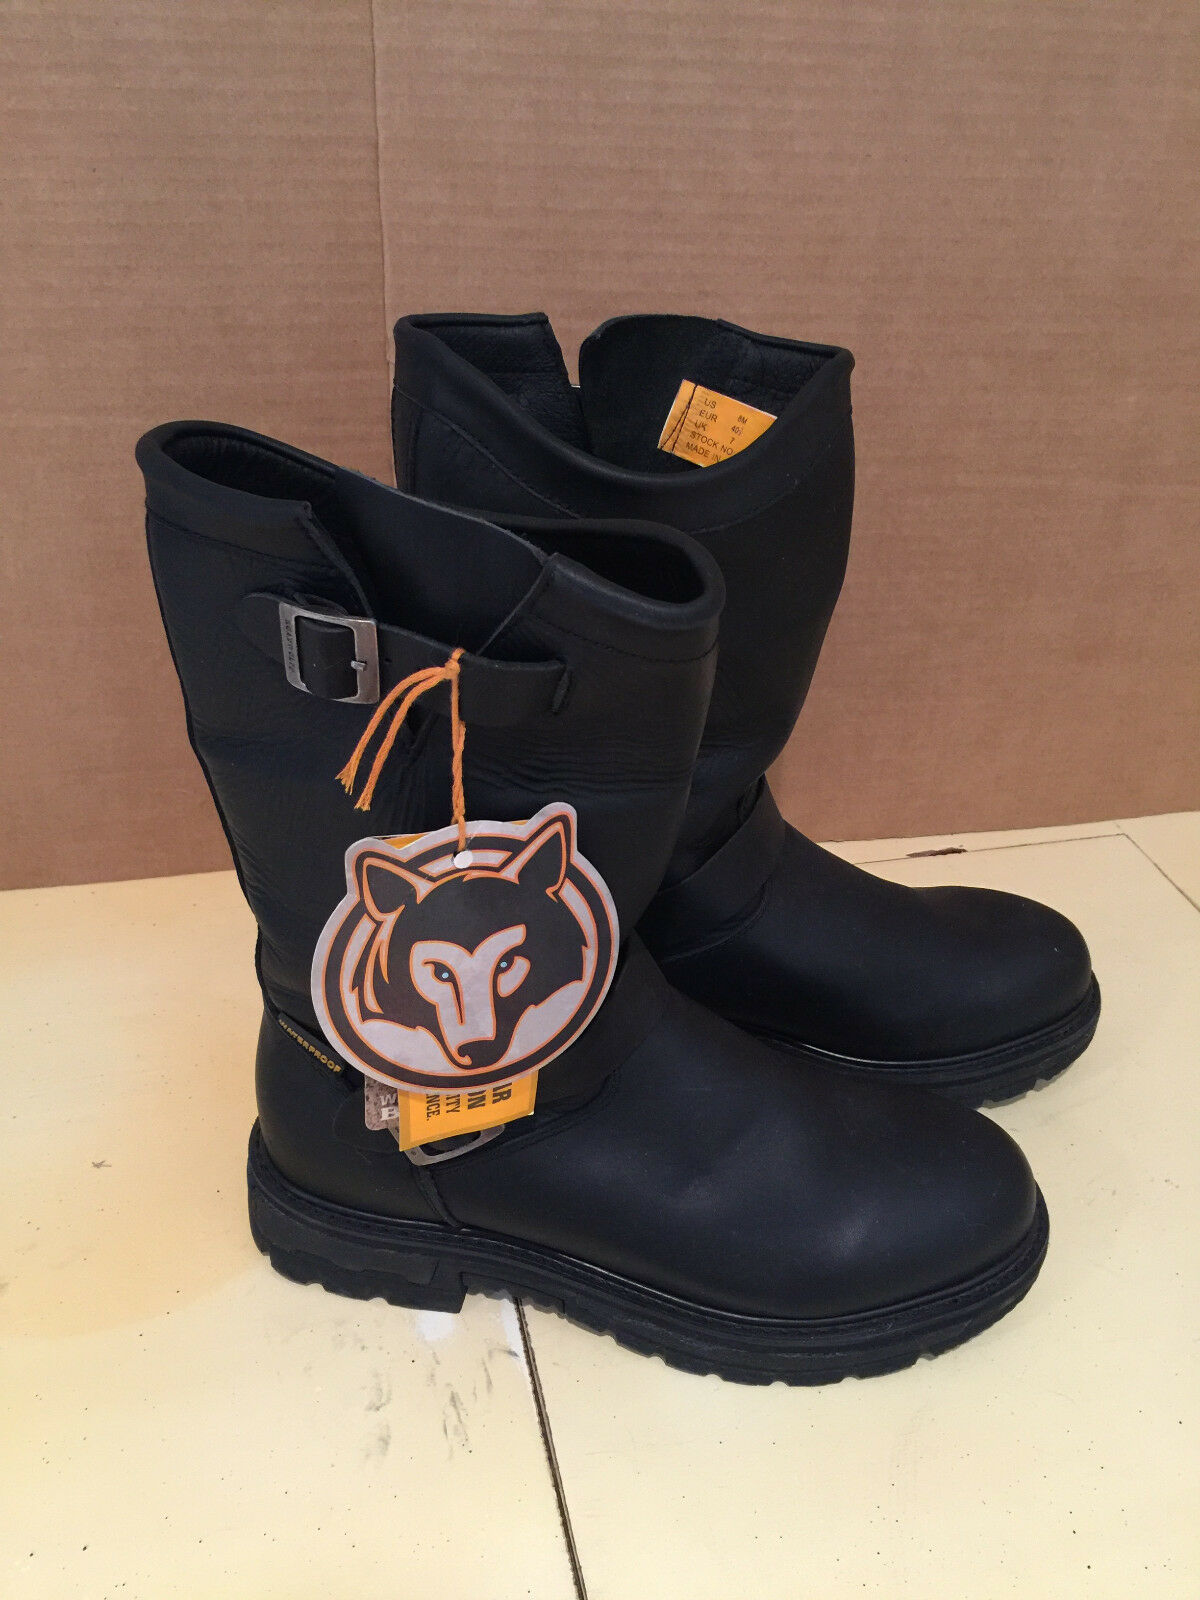 FOX  BIKER Stiefel NEW LADIES LEATHER 12  SZ 8M WATERPROOF NO BOX  99 retail